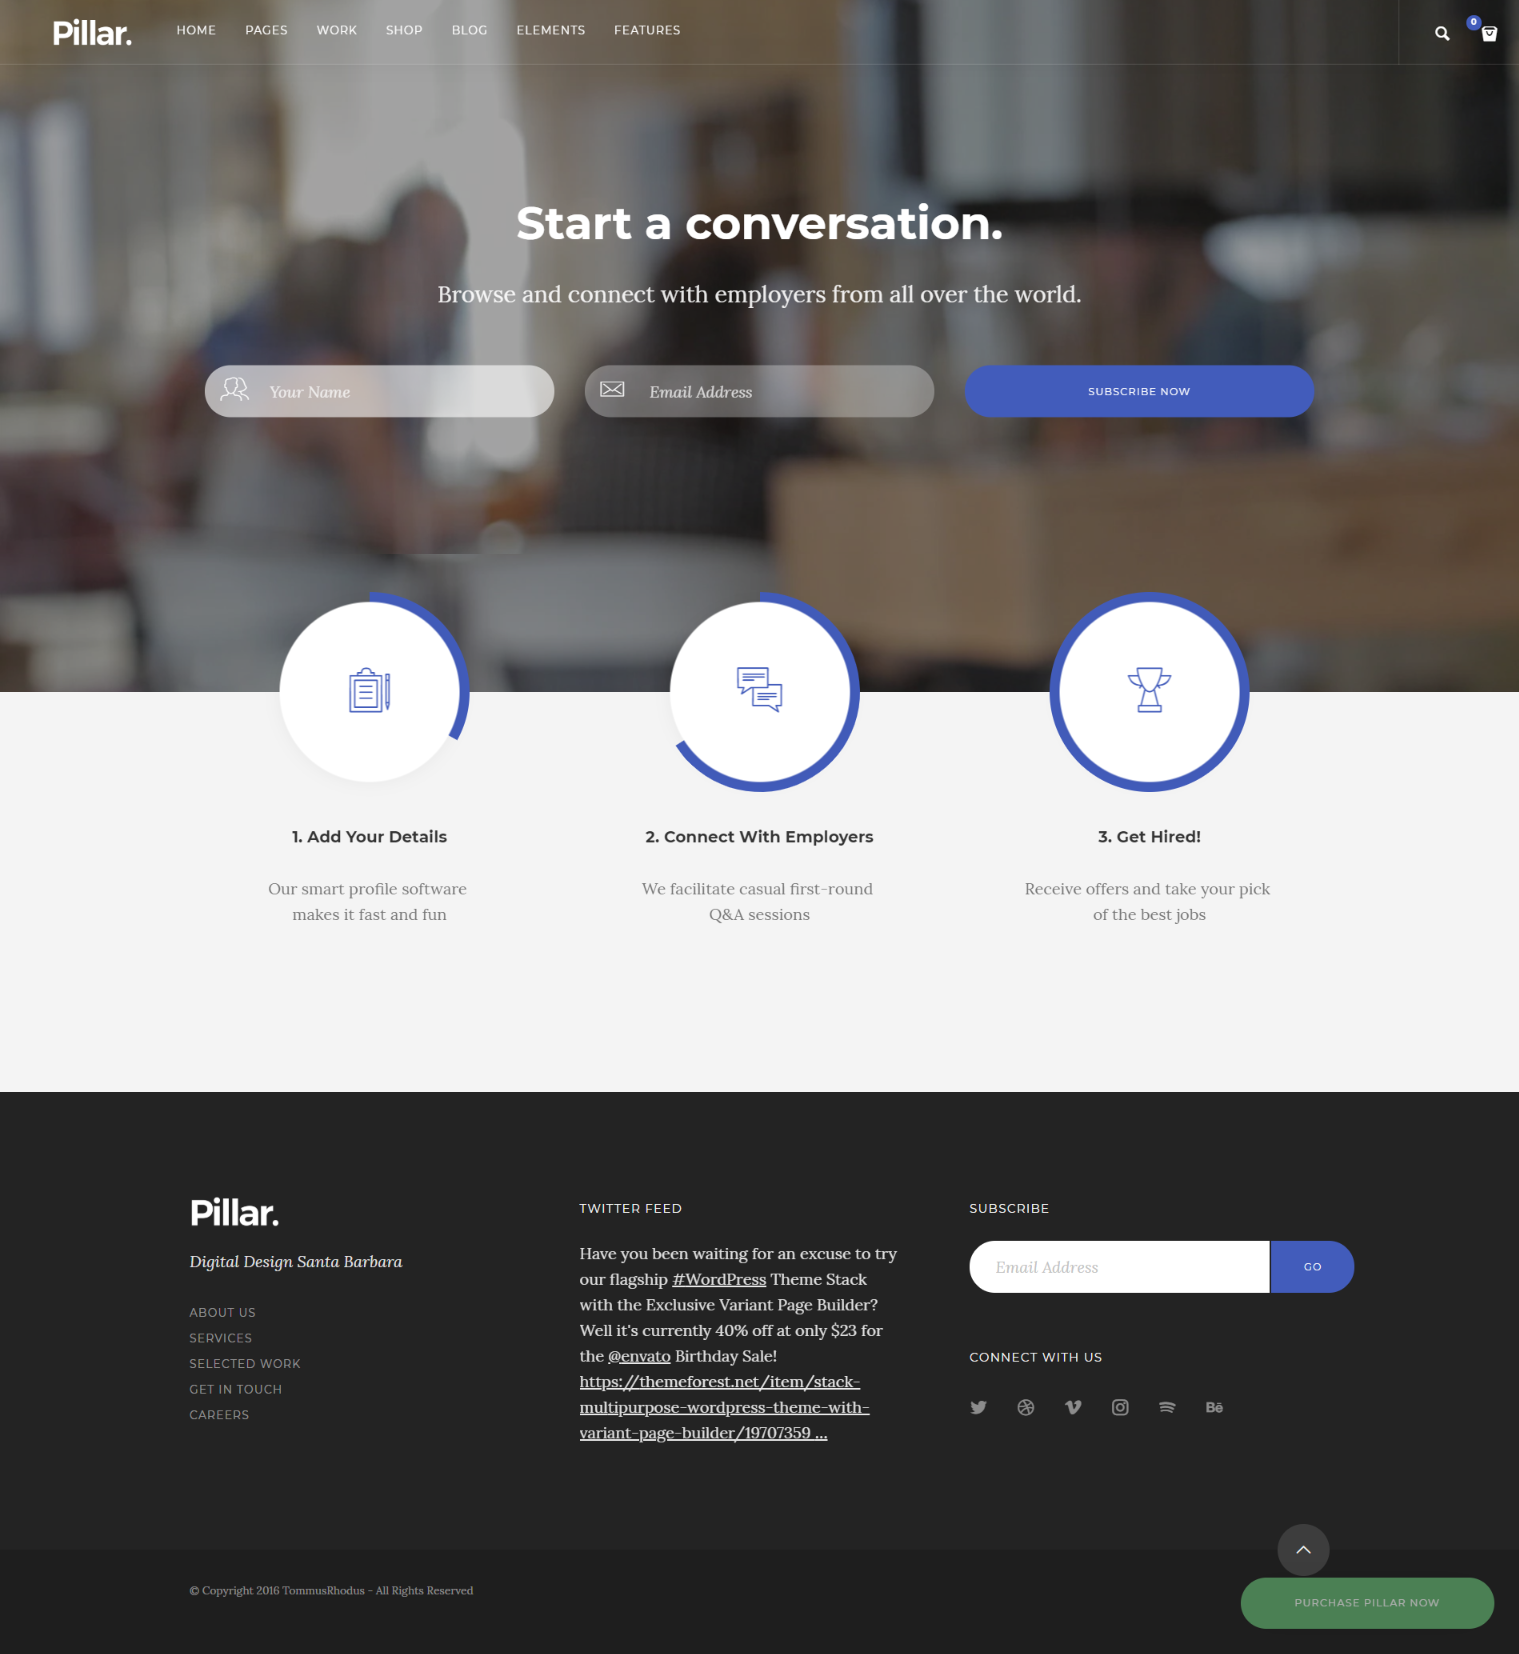 Top 10 Modern Stylish Trendy Wordpress Themes For A New Startup Company Startup Website Wordpress Theme Website Template Design